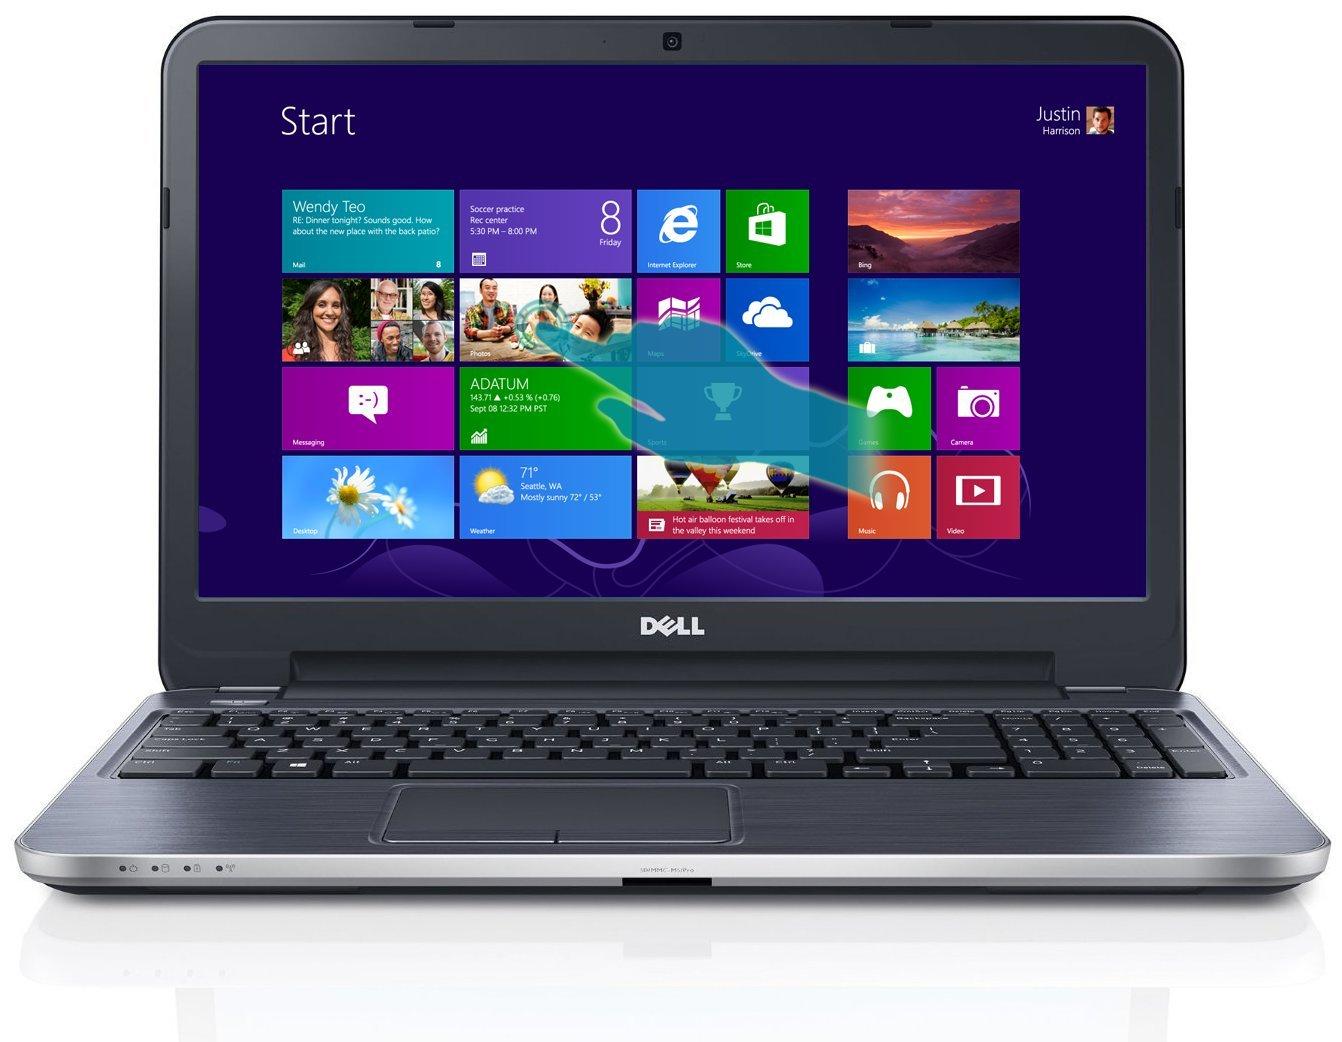 Dell Inspiron 15R i15RMT-5099SLV 15.6-Inch Touchscreen Laptop (Moon Silver)(US Version, Imported)   B00CRGJJHU